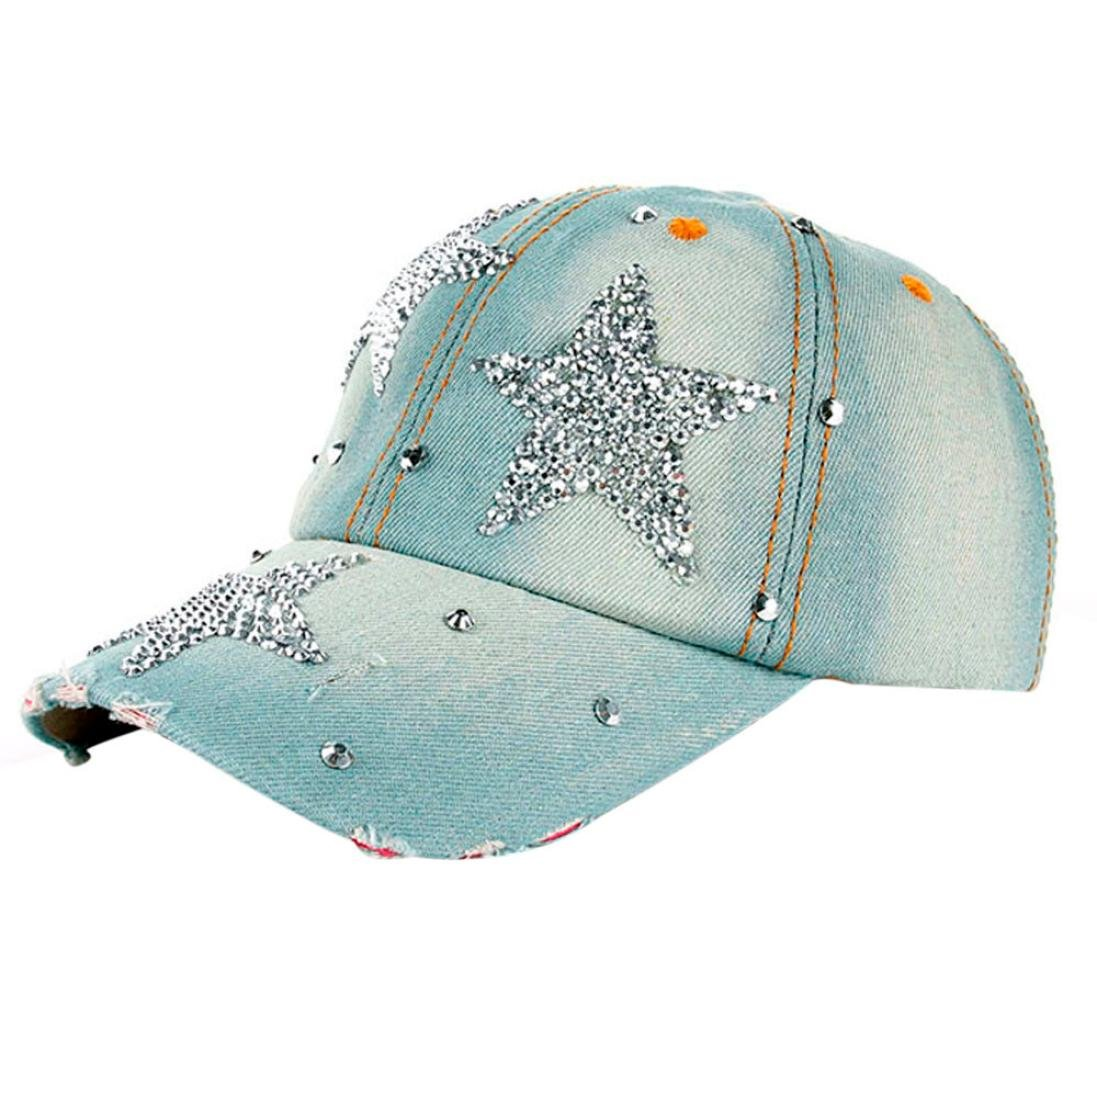 Absolute Gorras Béisbol,Sombrero de Malla para Adultos Gorra de Béisbol de Secado Rápido Plegable de Sun Hat Protector Solar (Azul A): Amazon.es: Ropa y ...